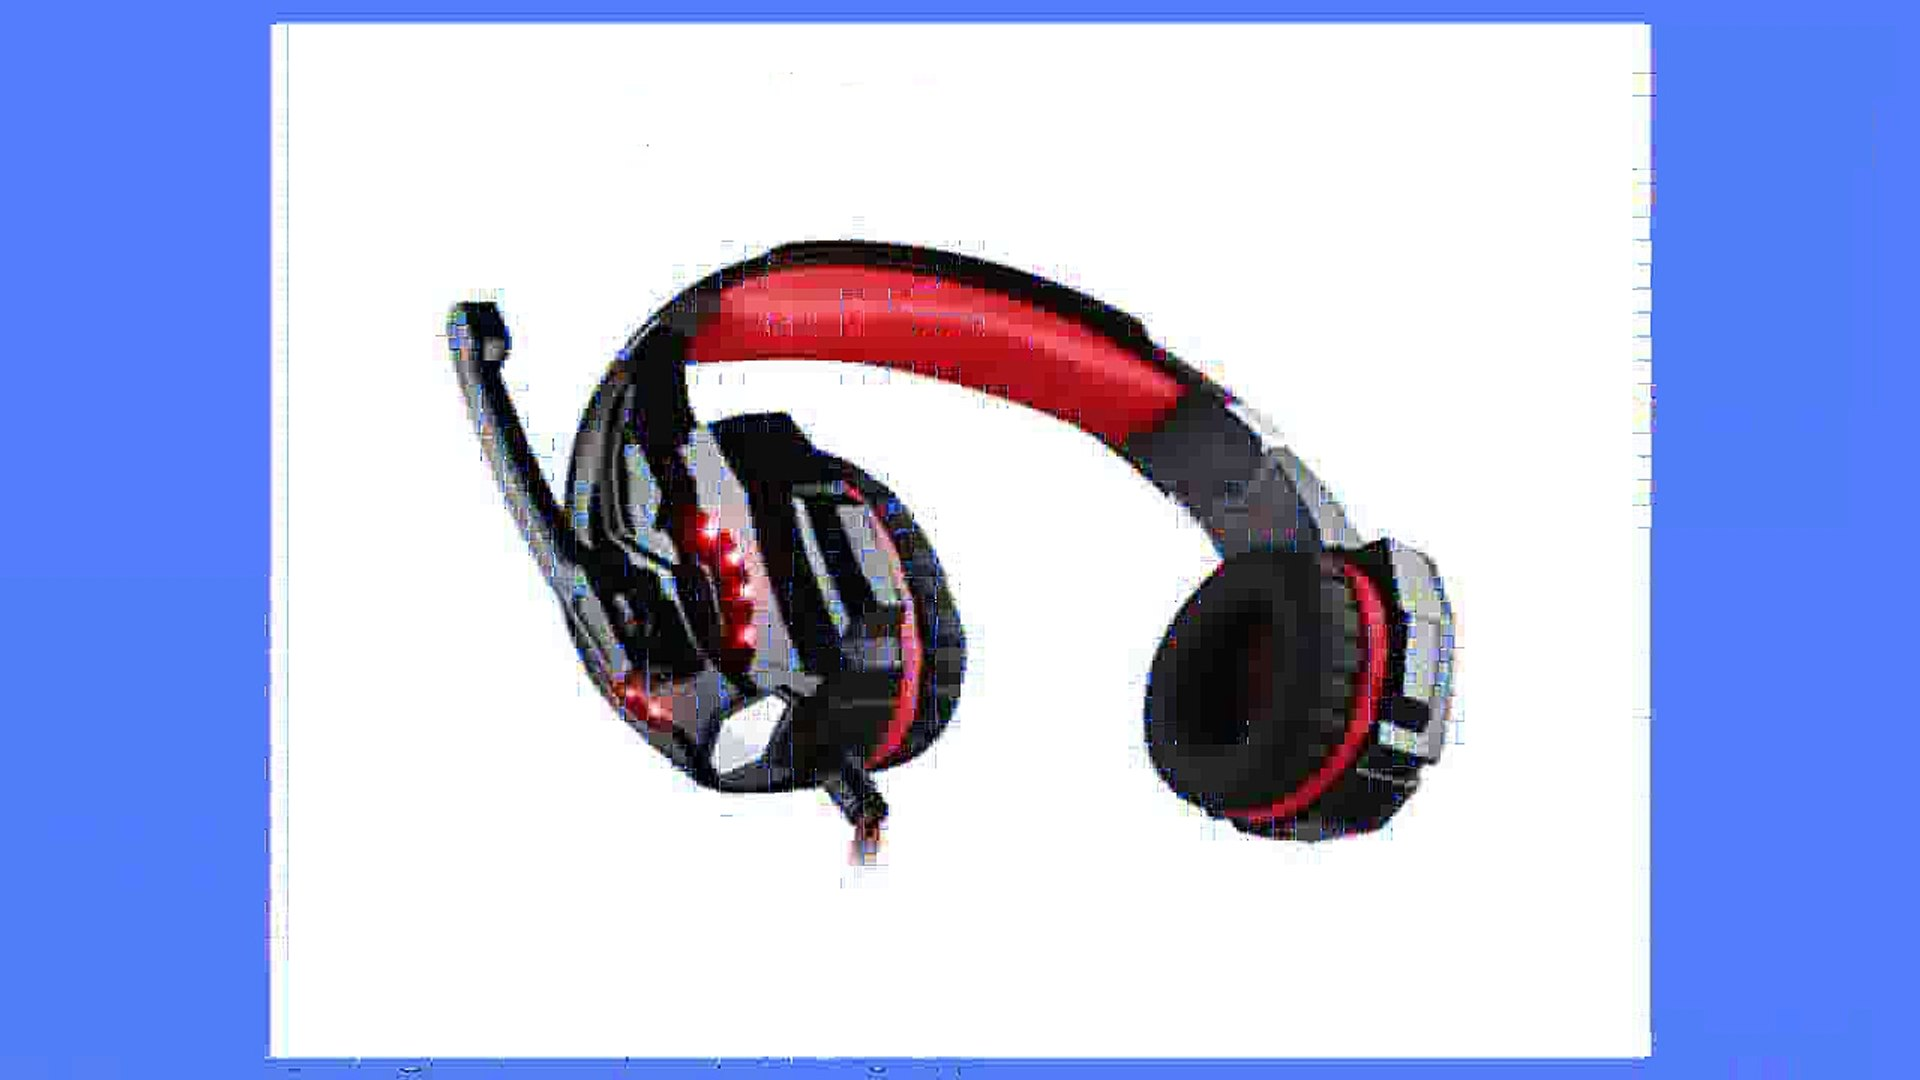 Best buy Gaming Headset  2015 New Version eTopxizu 35mm Game Gaming Headphone Headset Earphone Headb